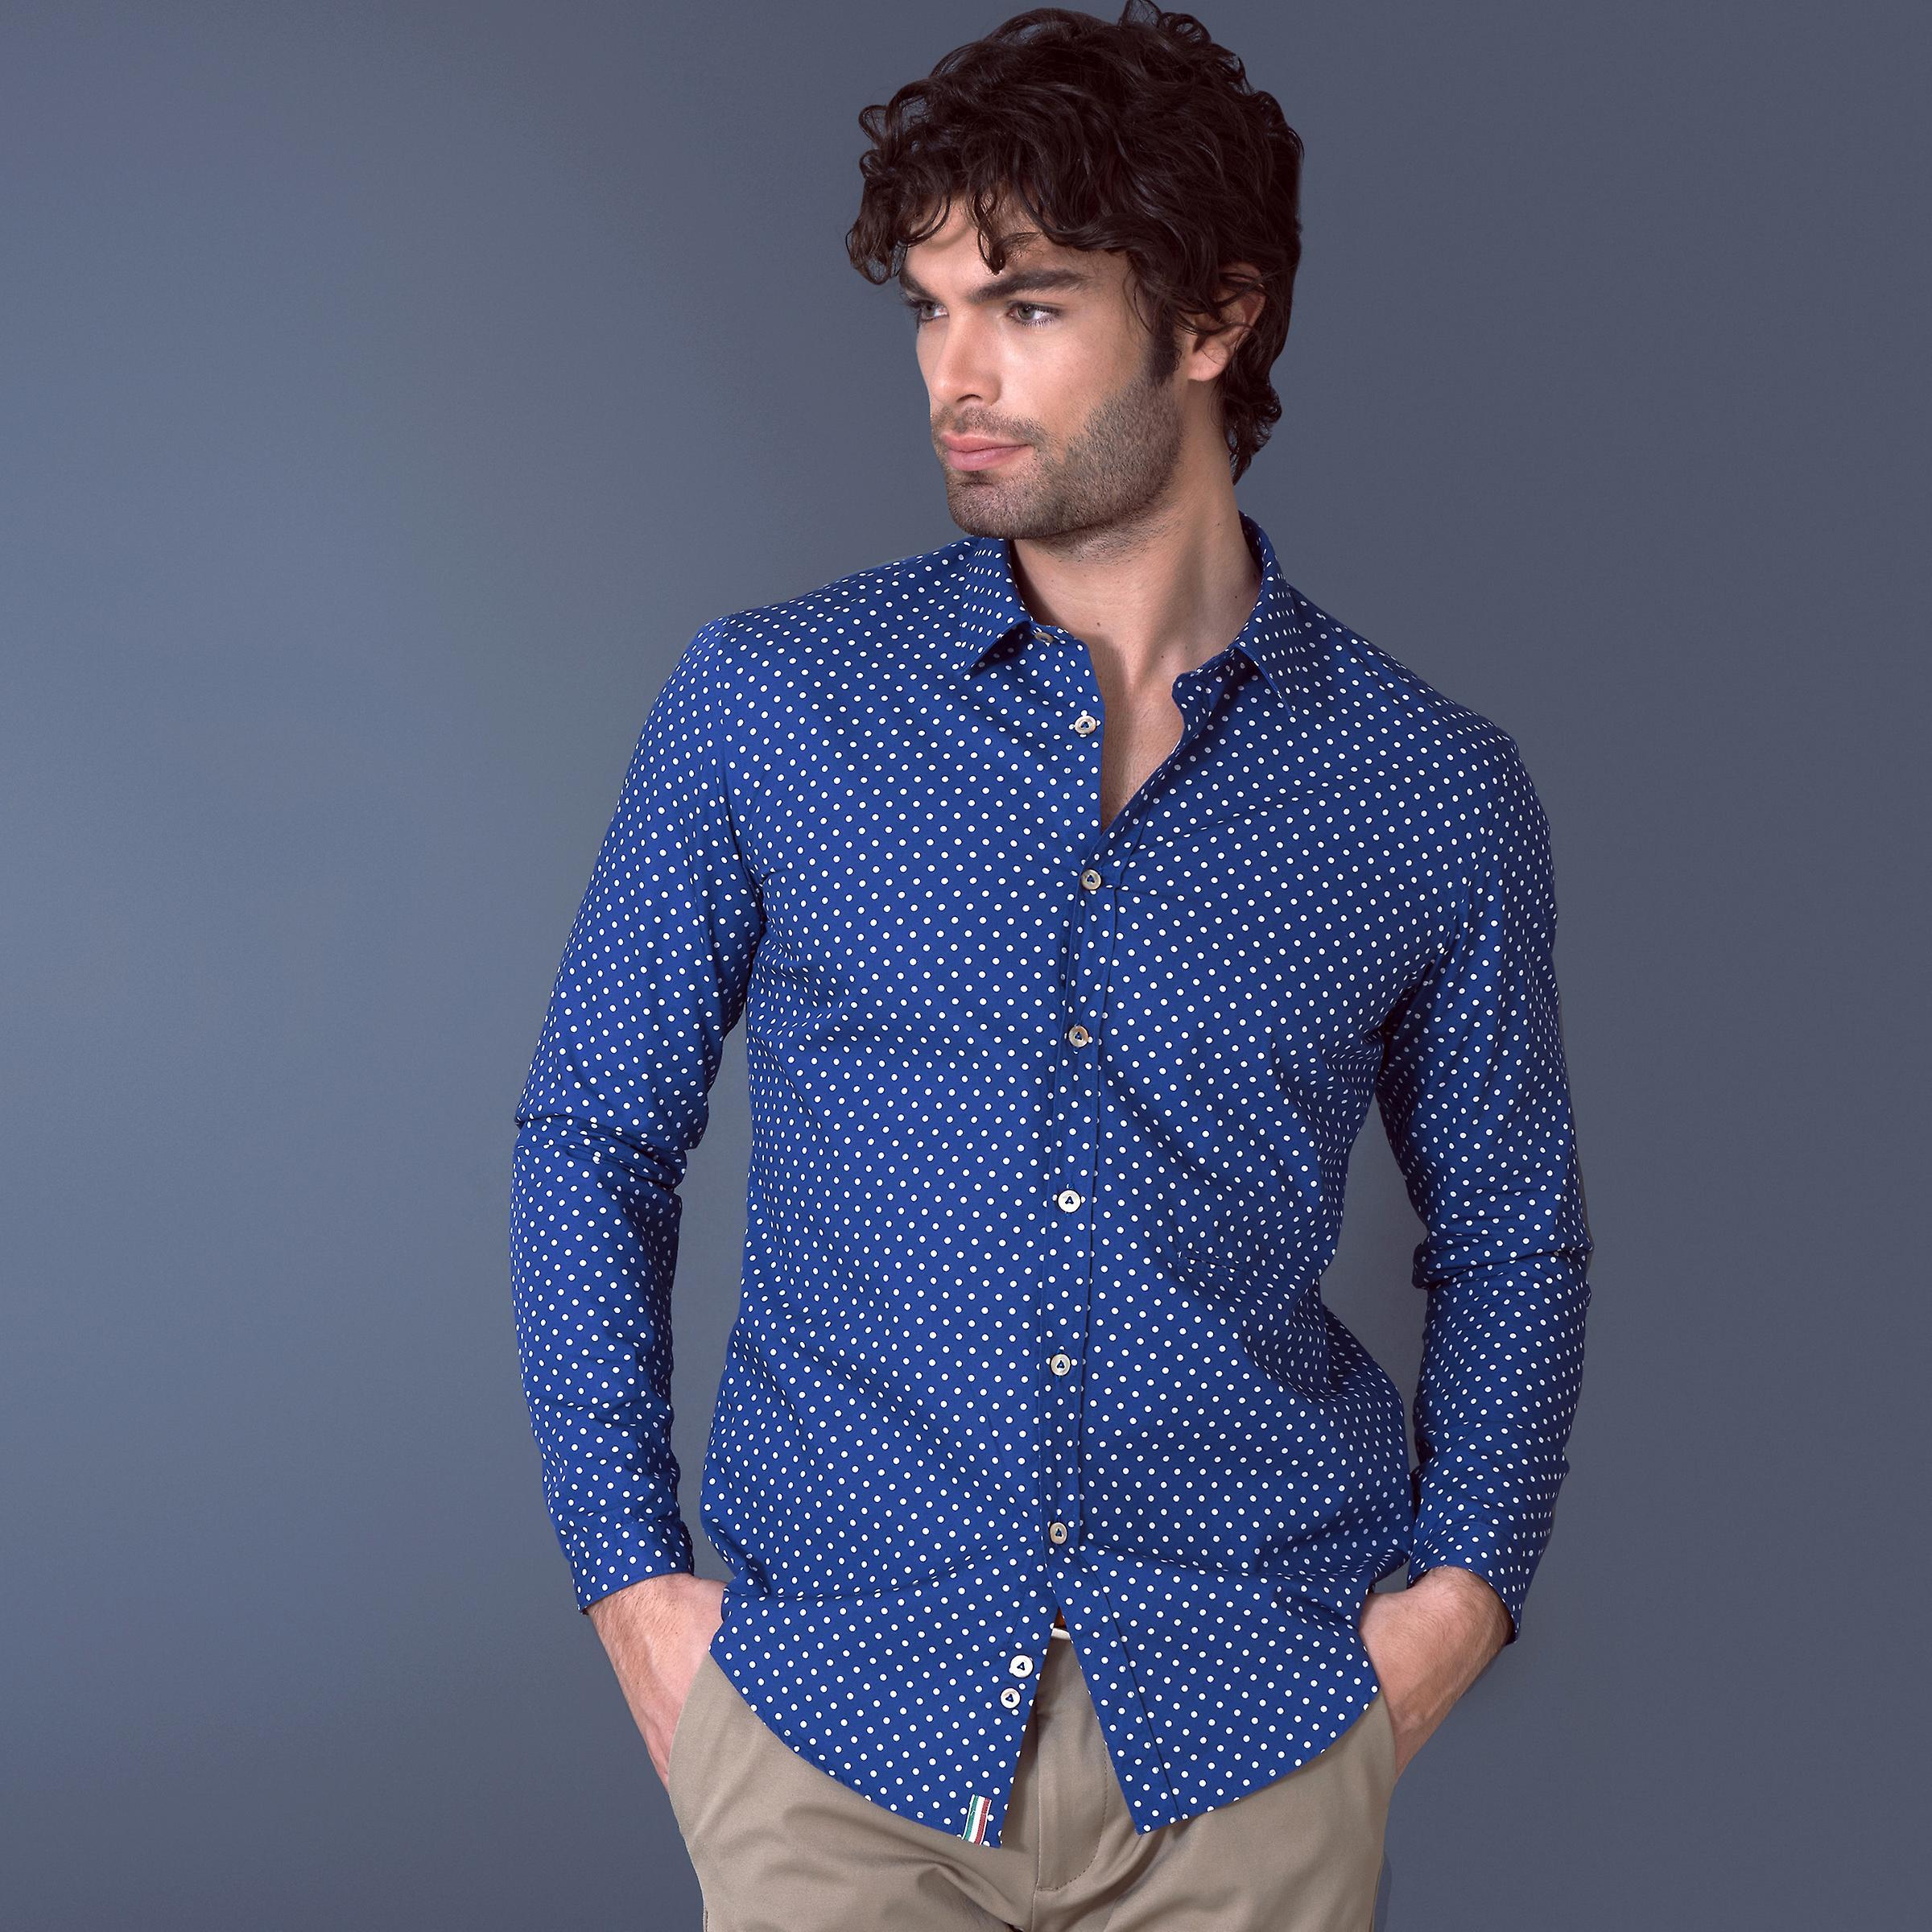 Fabio Giovanni Salento Shirt - Mens Classic Polka Dot Italian Casual Shirt